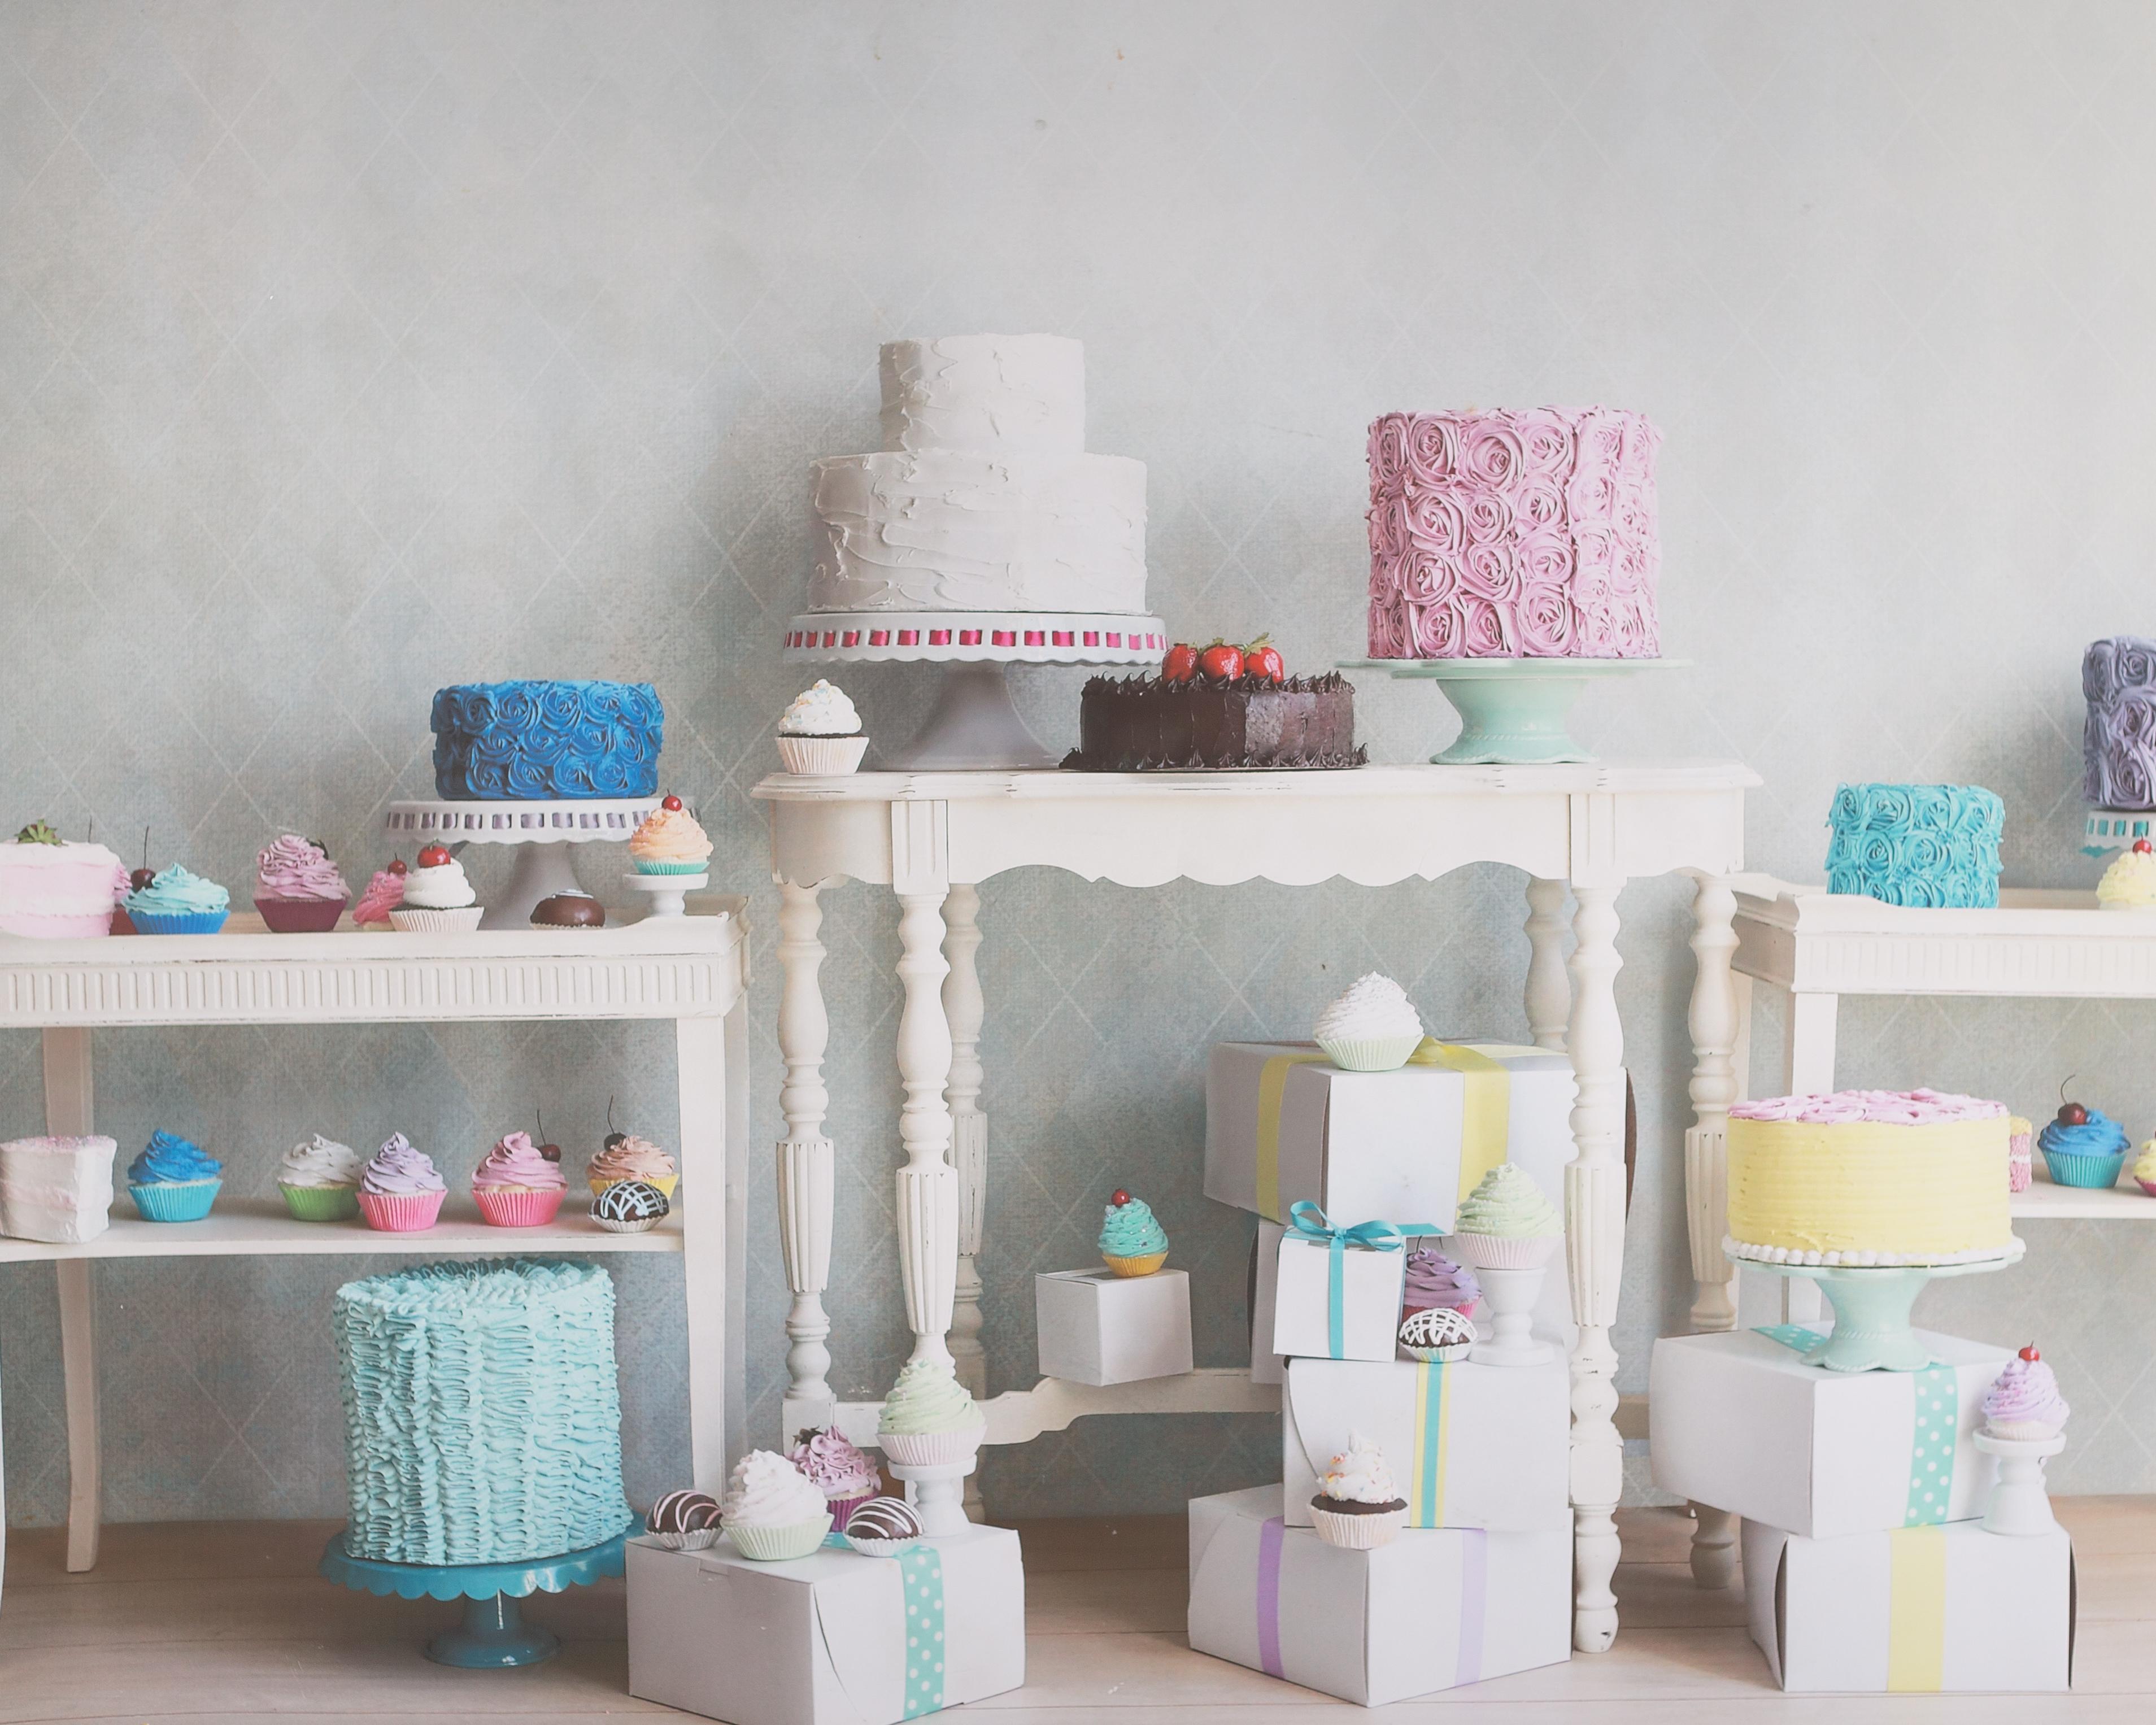 B-1 Cake Shop